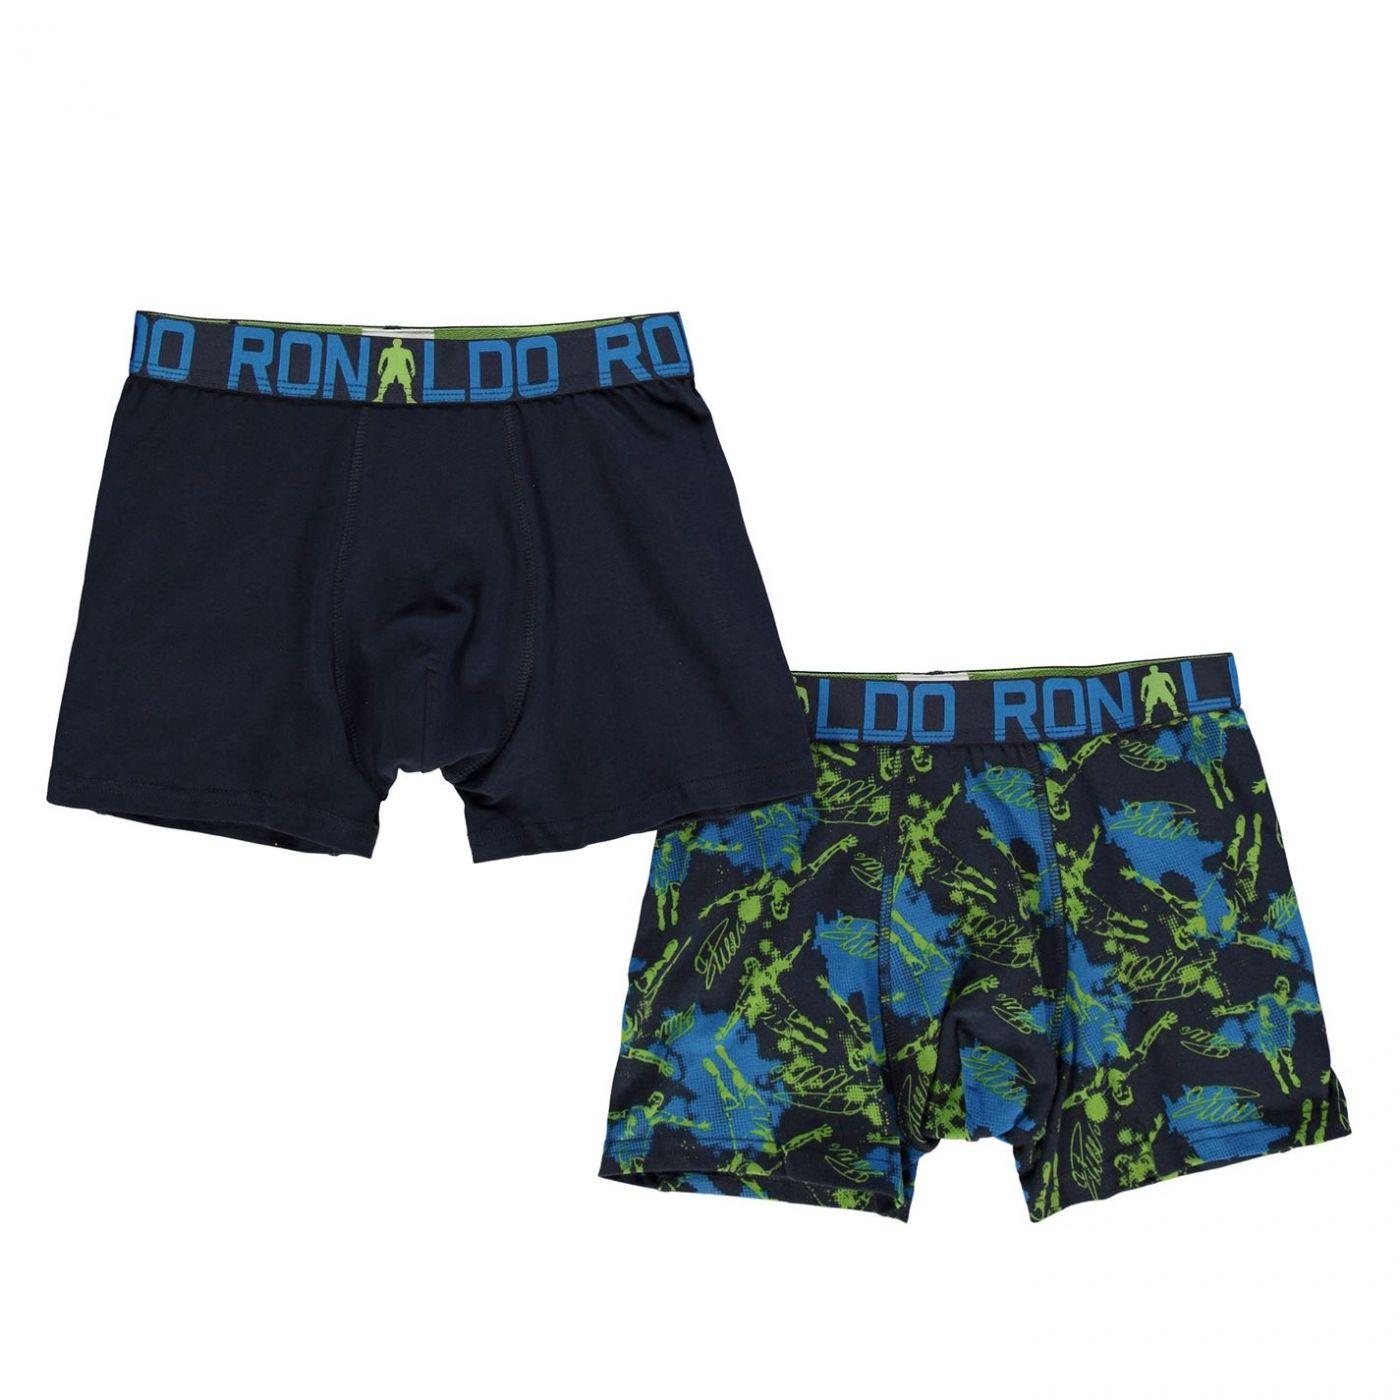 Cristiano Ronaldo 2 Pack Boxers Junior Boys